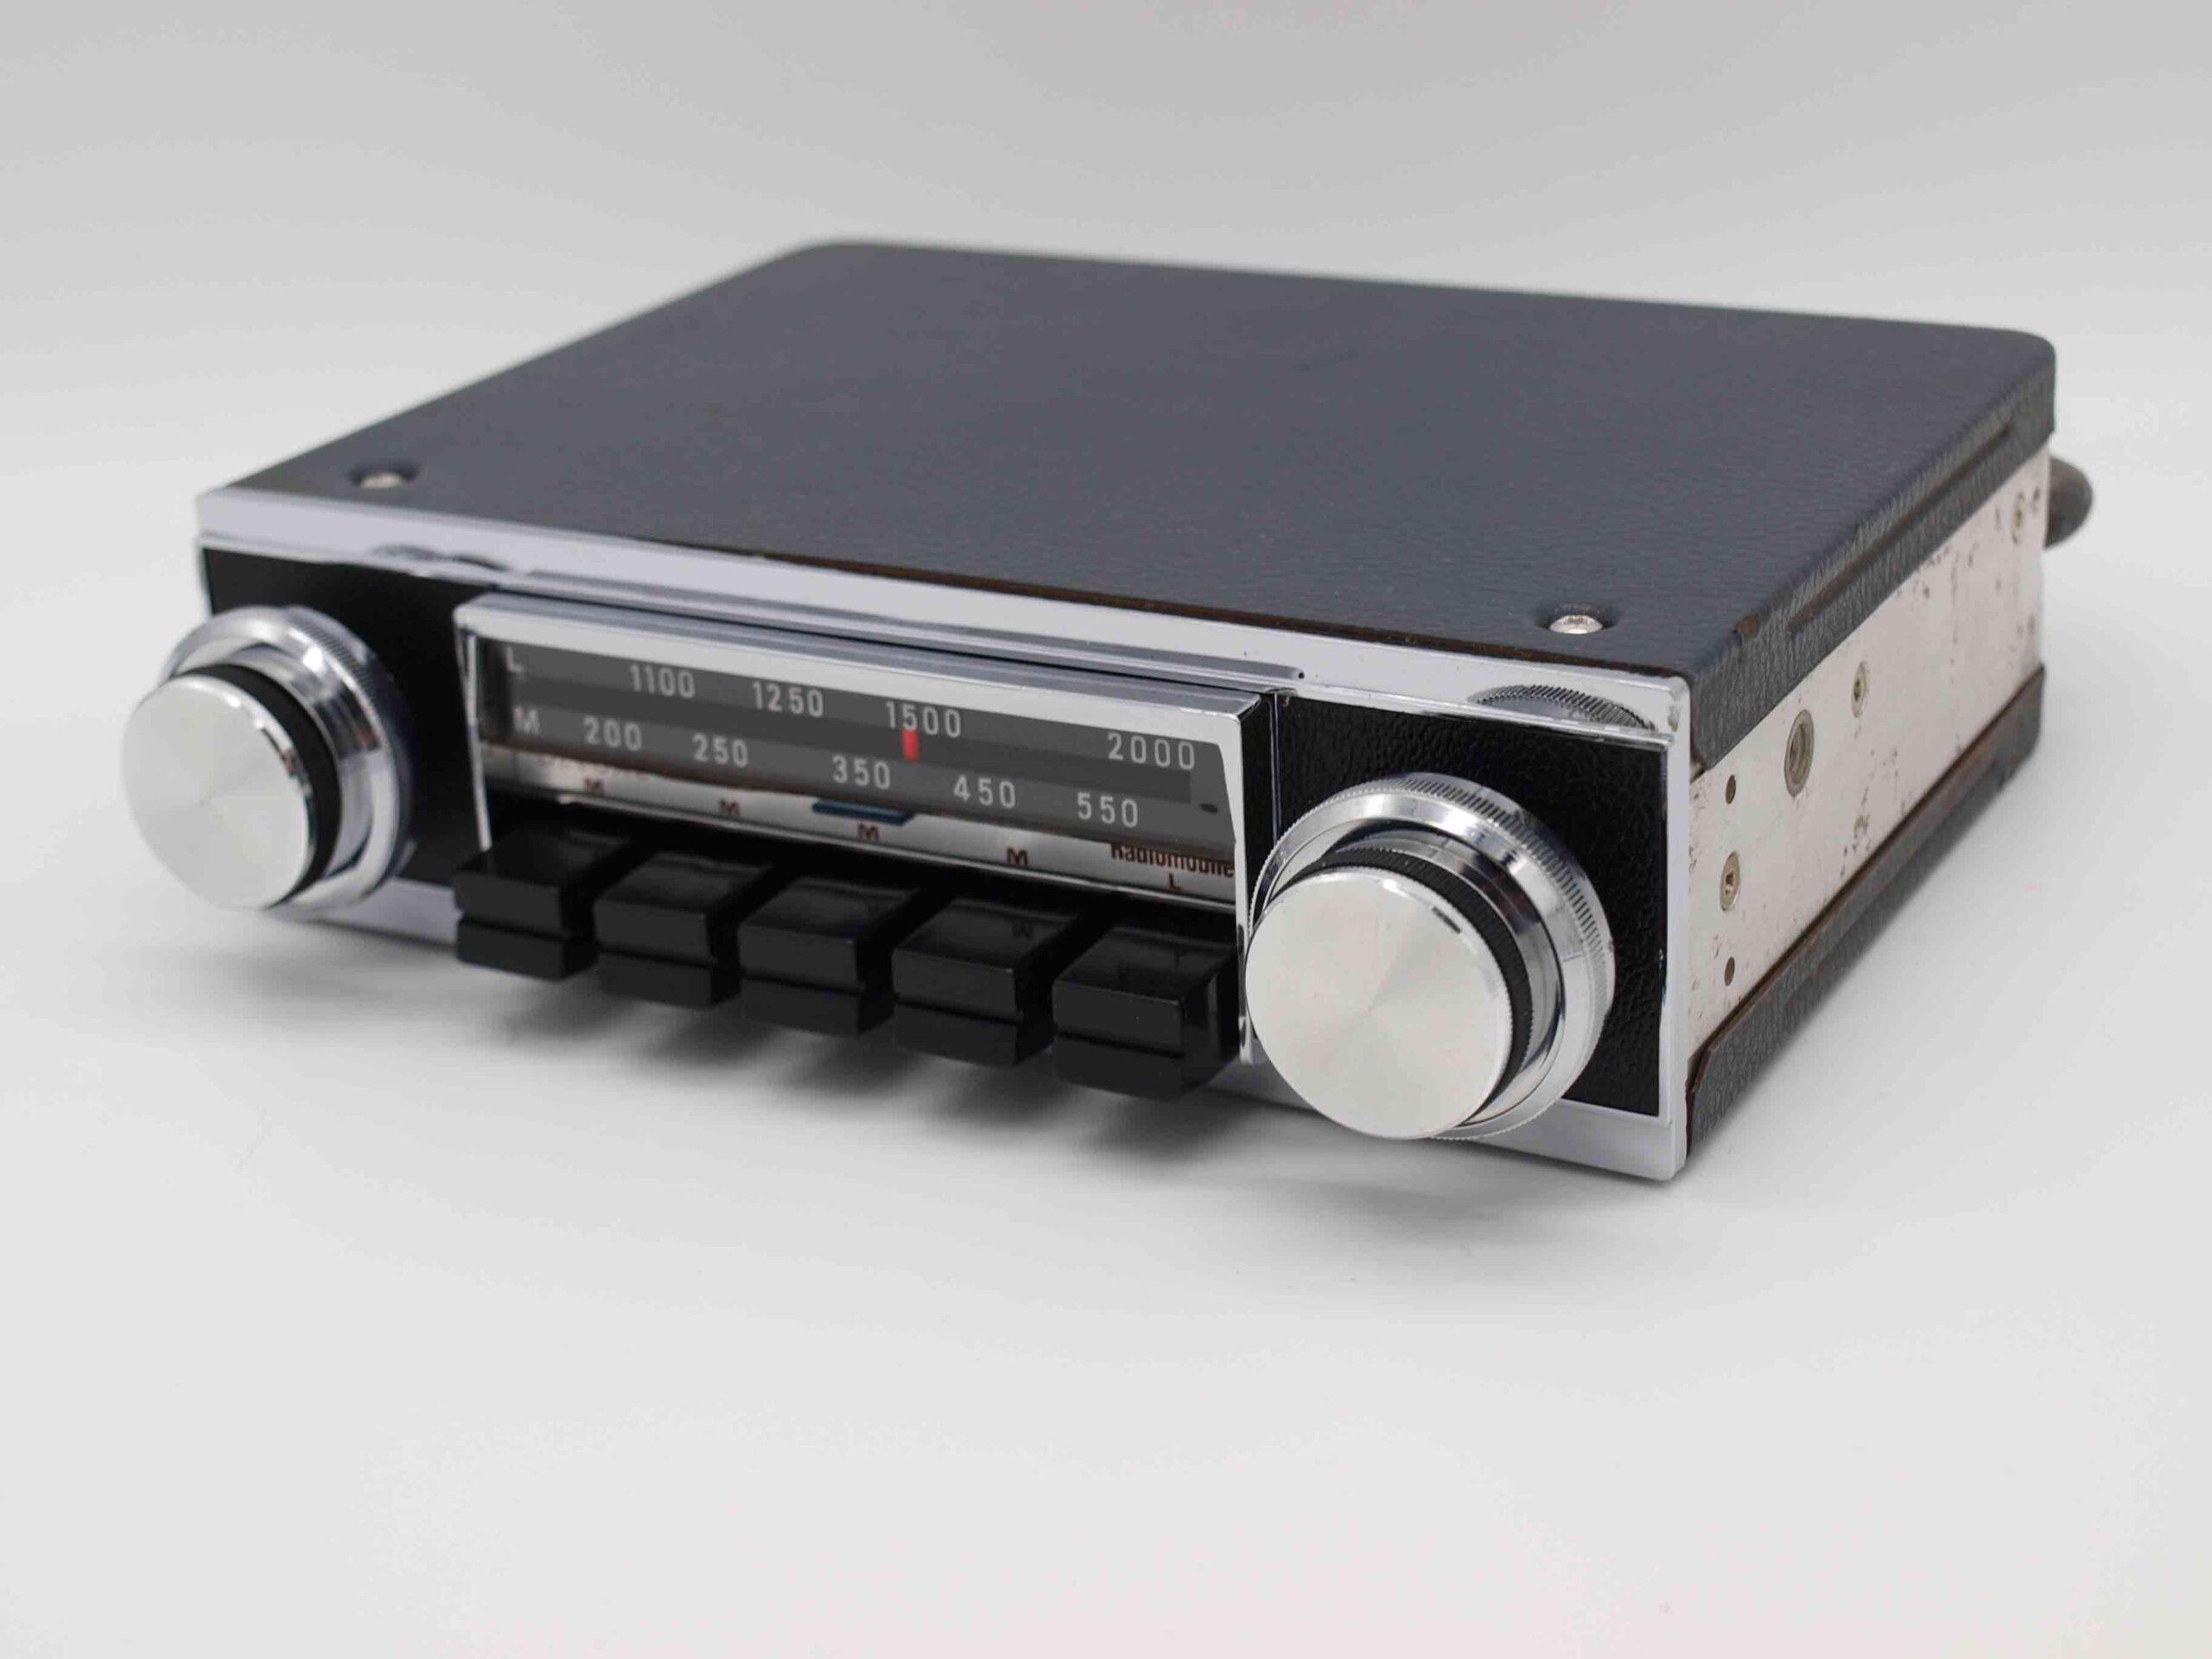 Radiomobile 1080FM